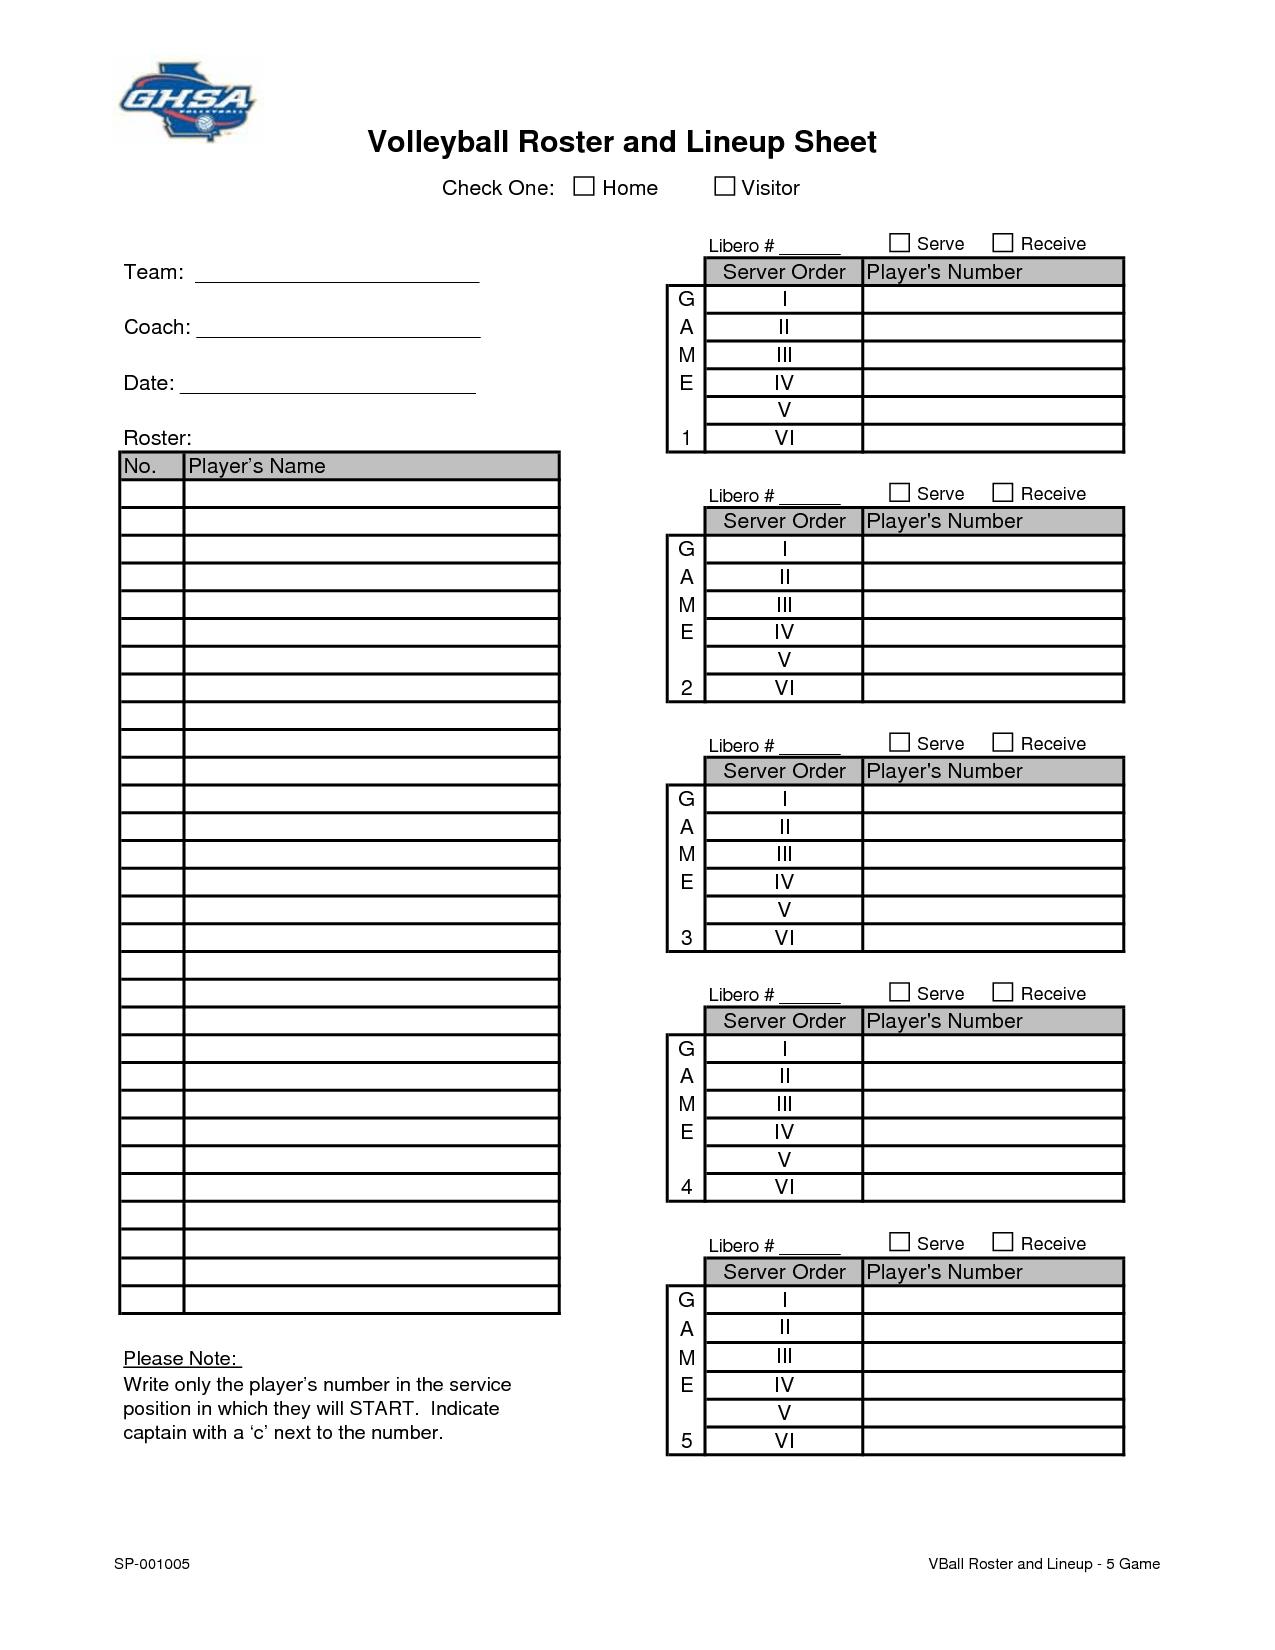 Blank Volleyball Lineup Sheets Printable